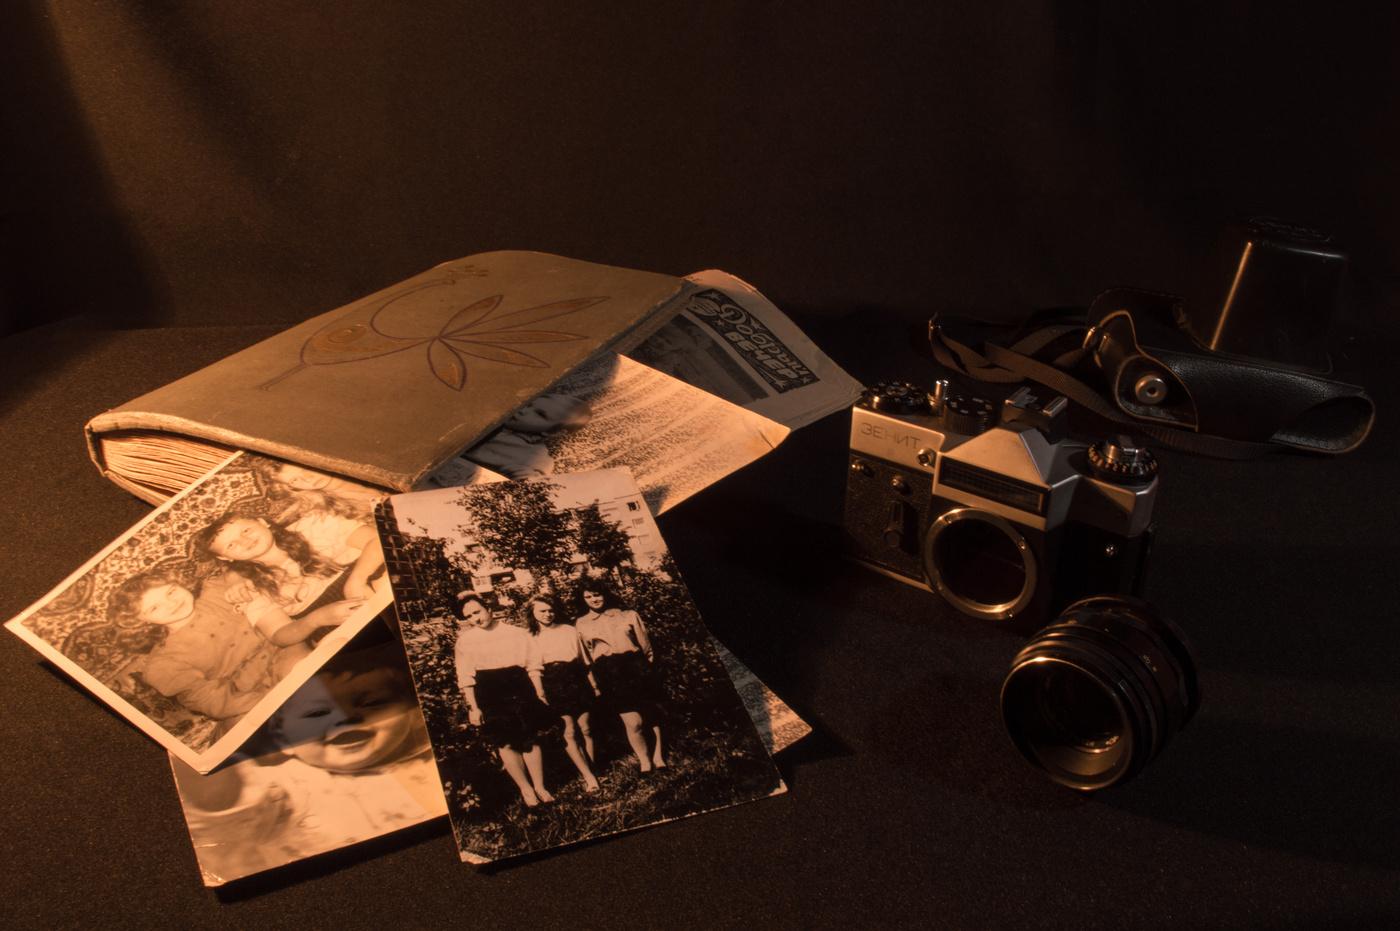 варшавский картинки про воспоминания центре